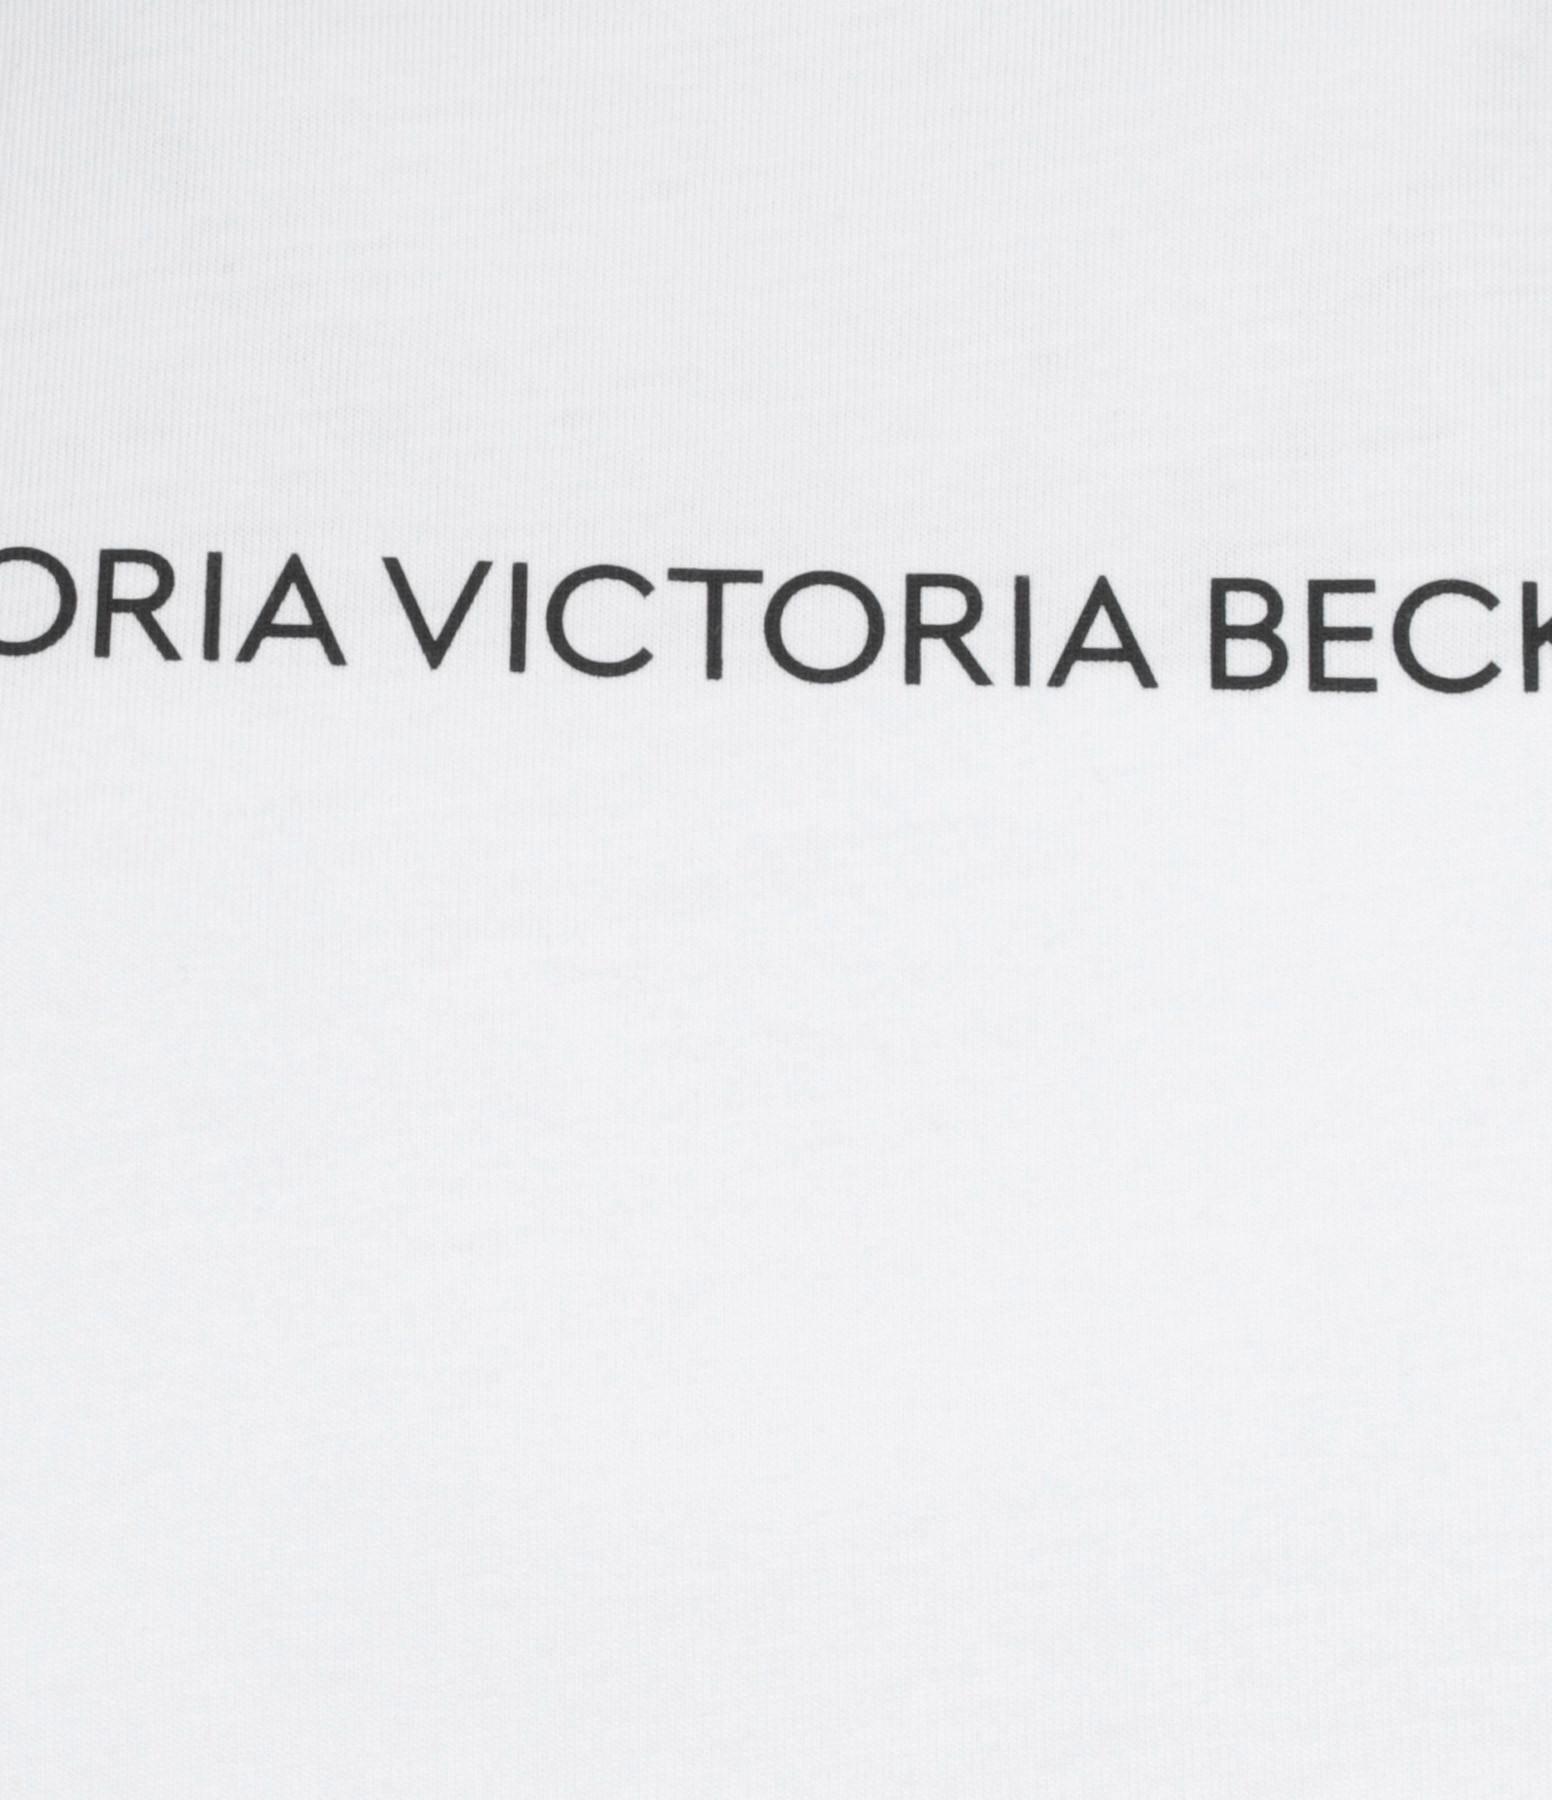 VICTORIA VICTORIA BECKHAM - Tee-shirt Logo Blanc